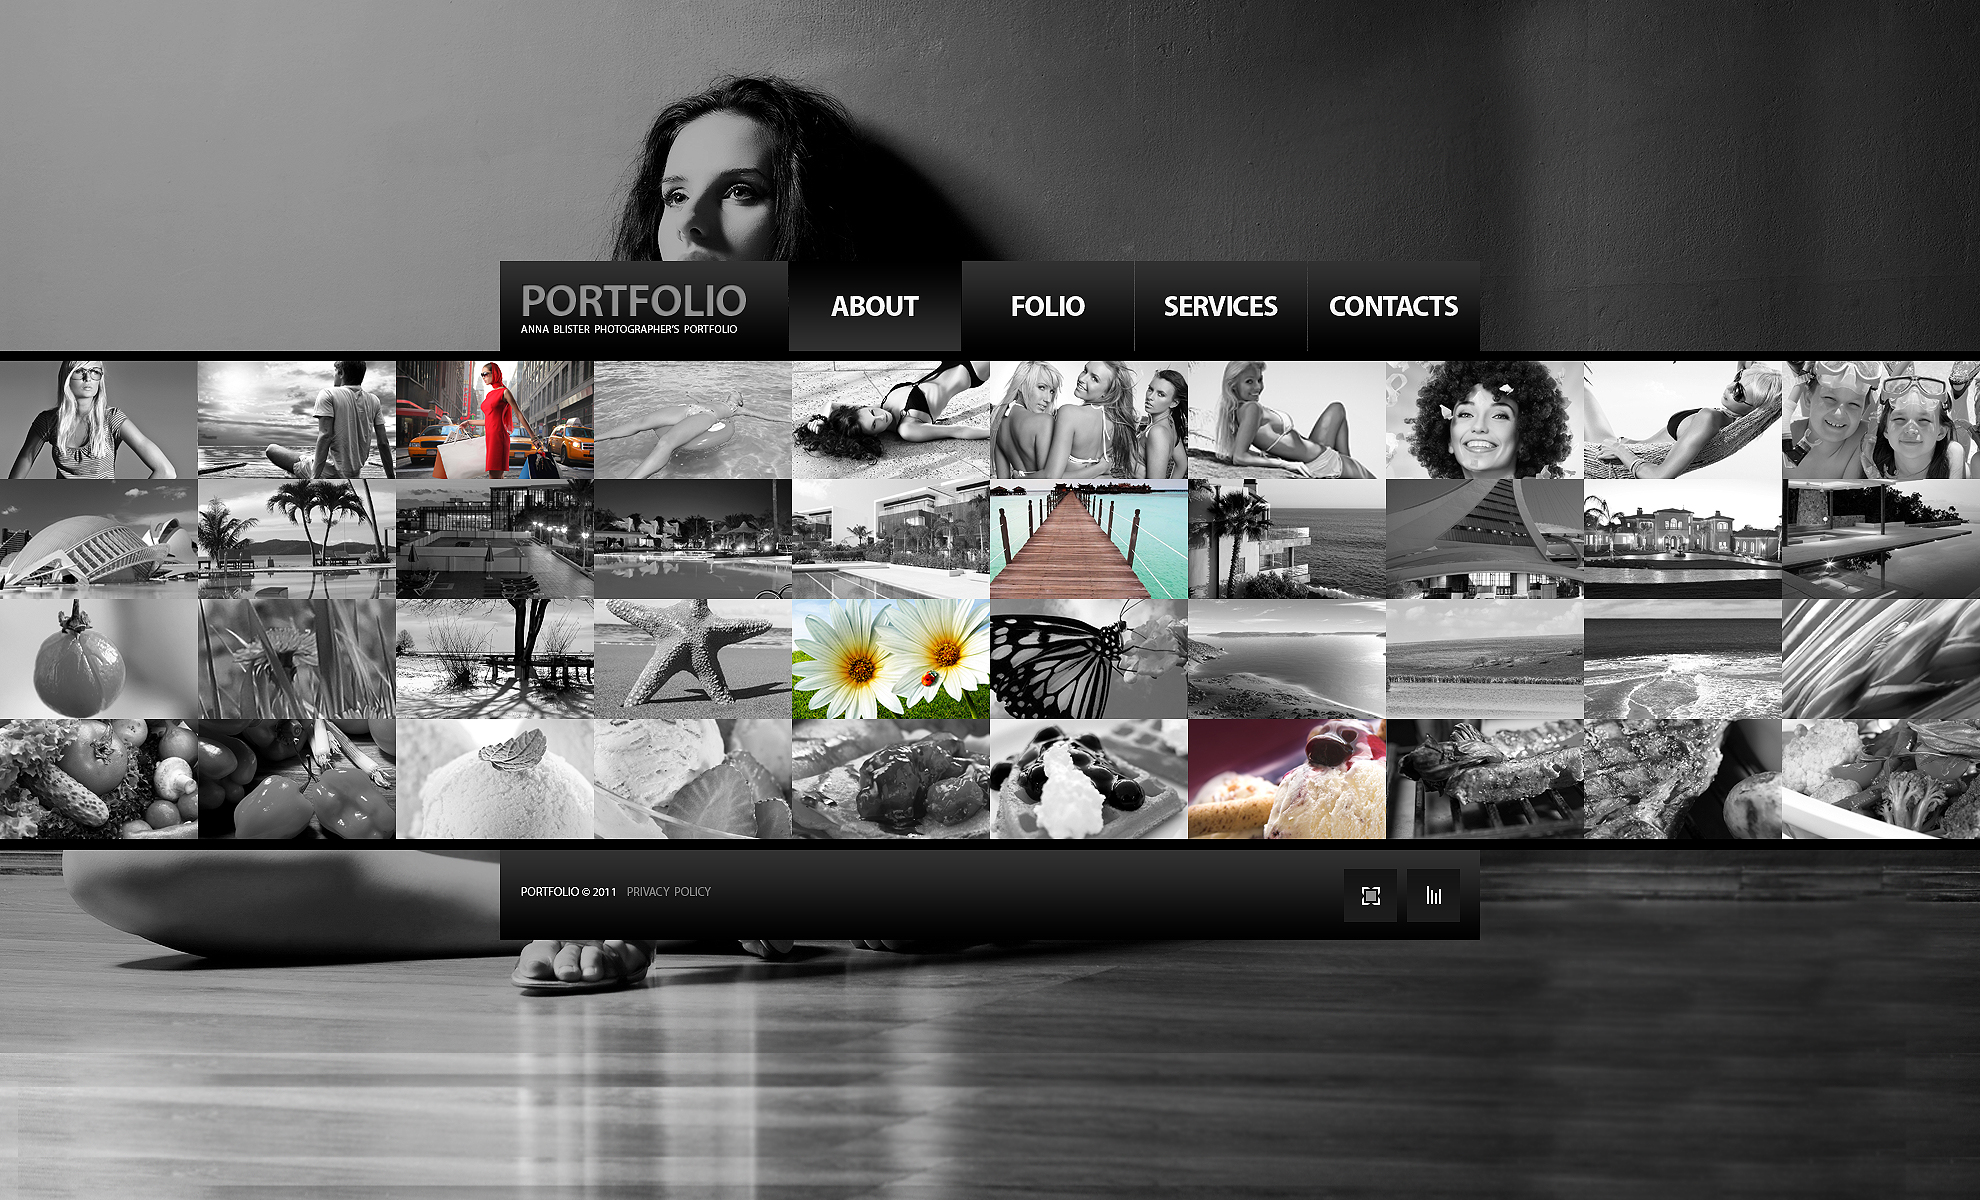 Foto Galerij Template over Fotograaf portfolio №33955 - screenshot